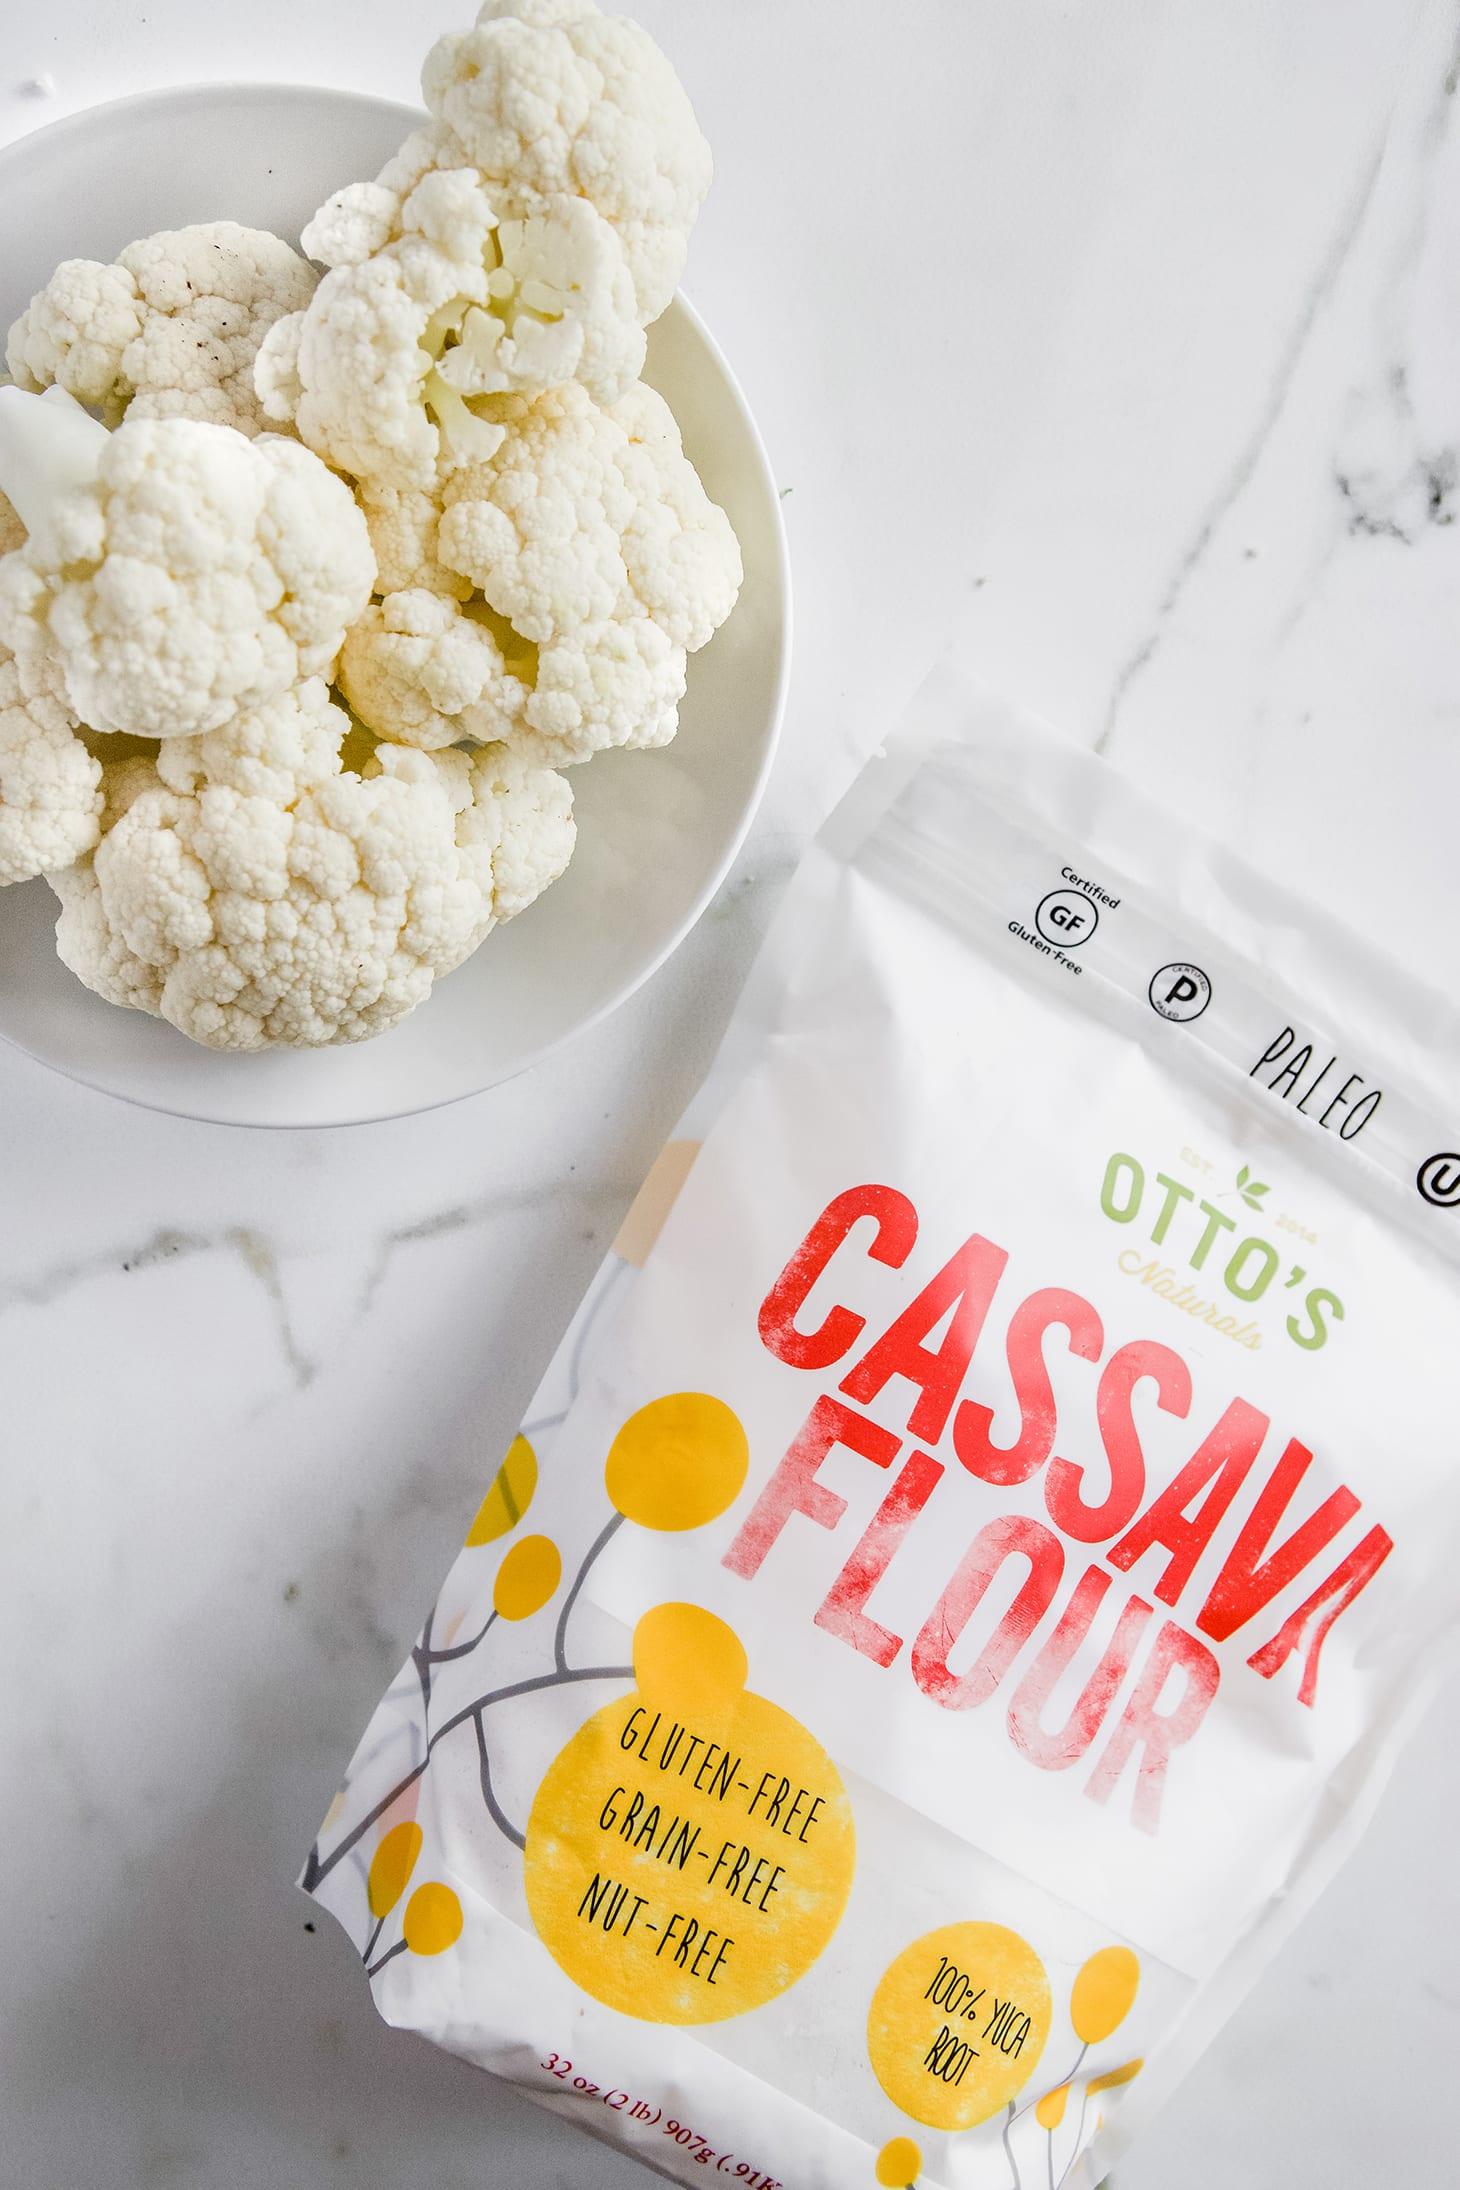 Jillian Harris Cauliflower Gnocchi